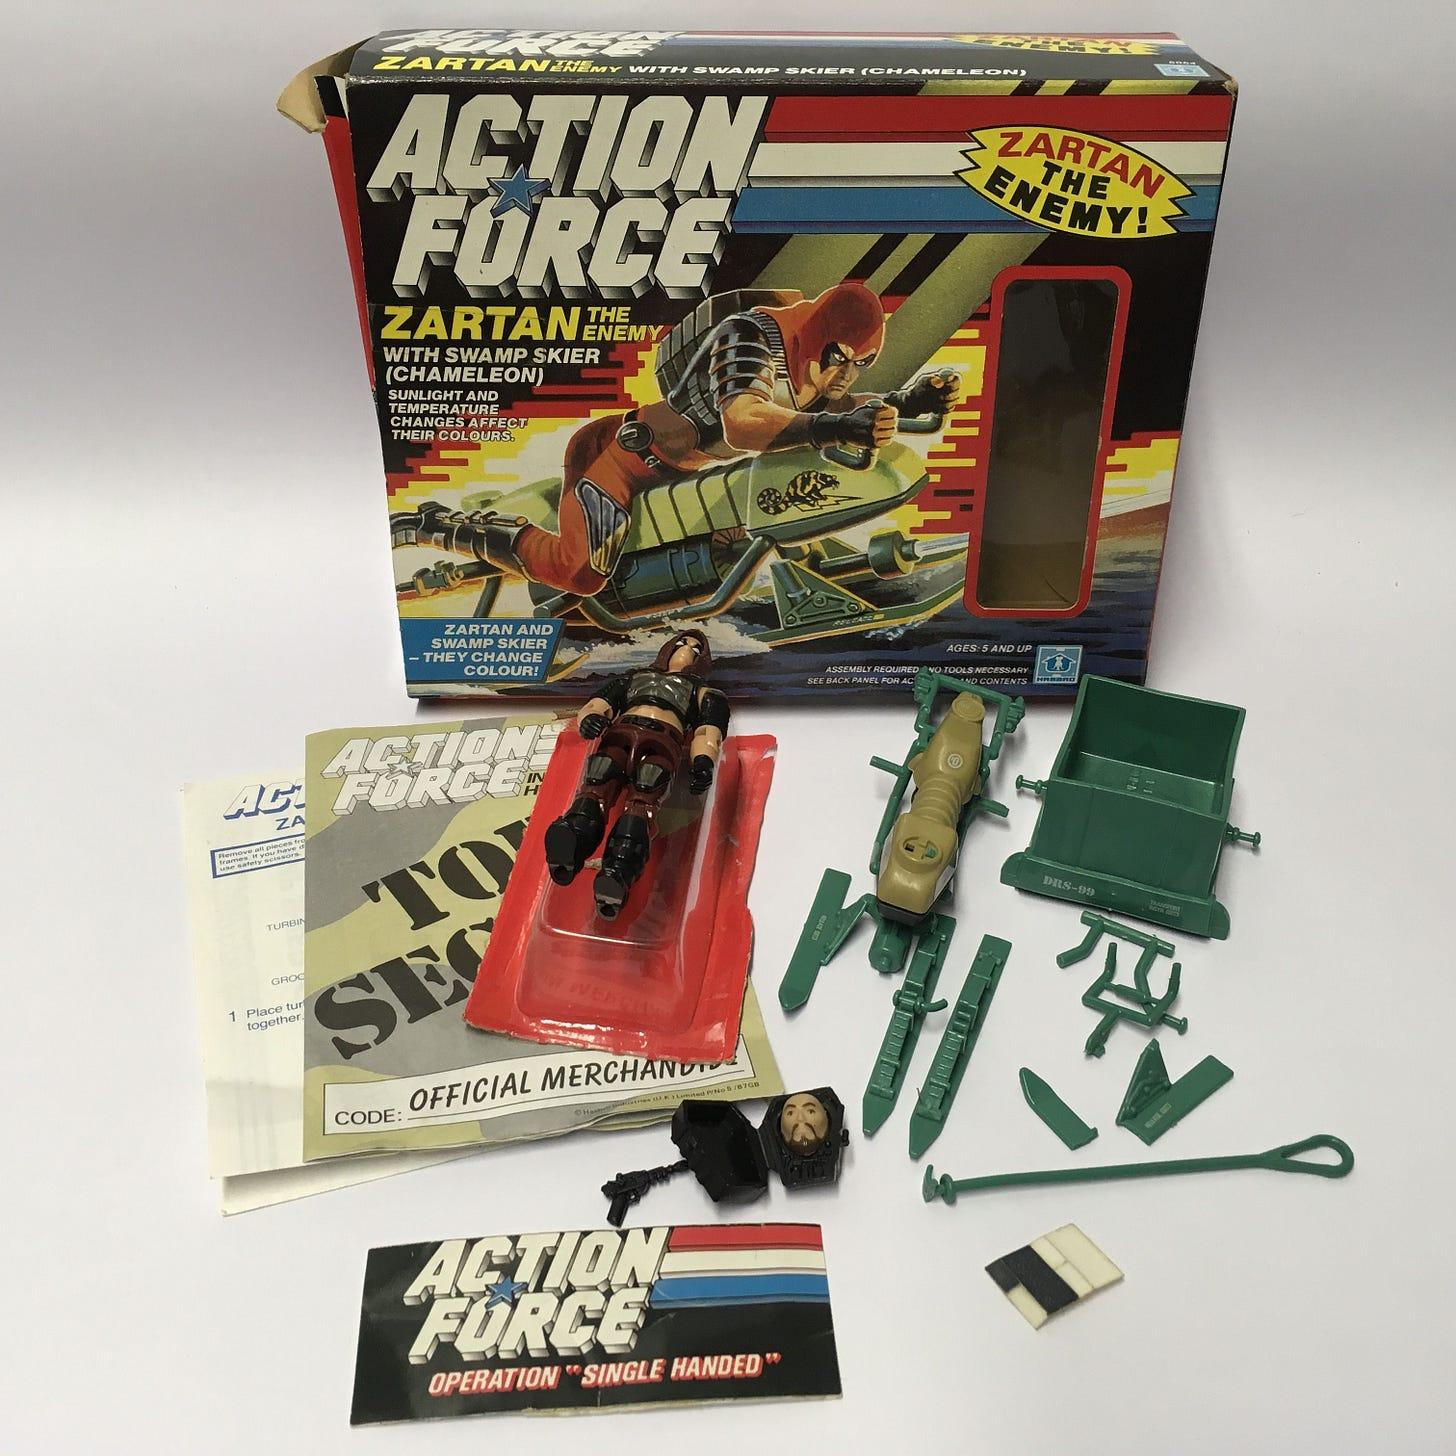 Pin de Millions of Toys en Vintage Action Force GI Joe Toys And Figures